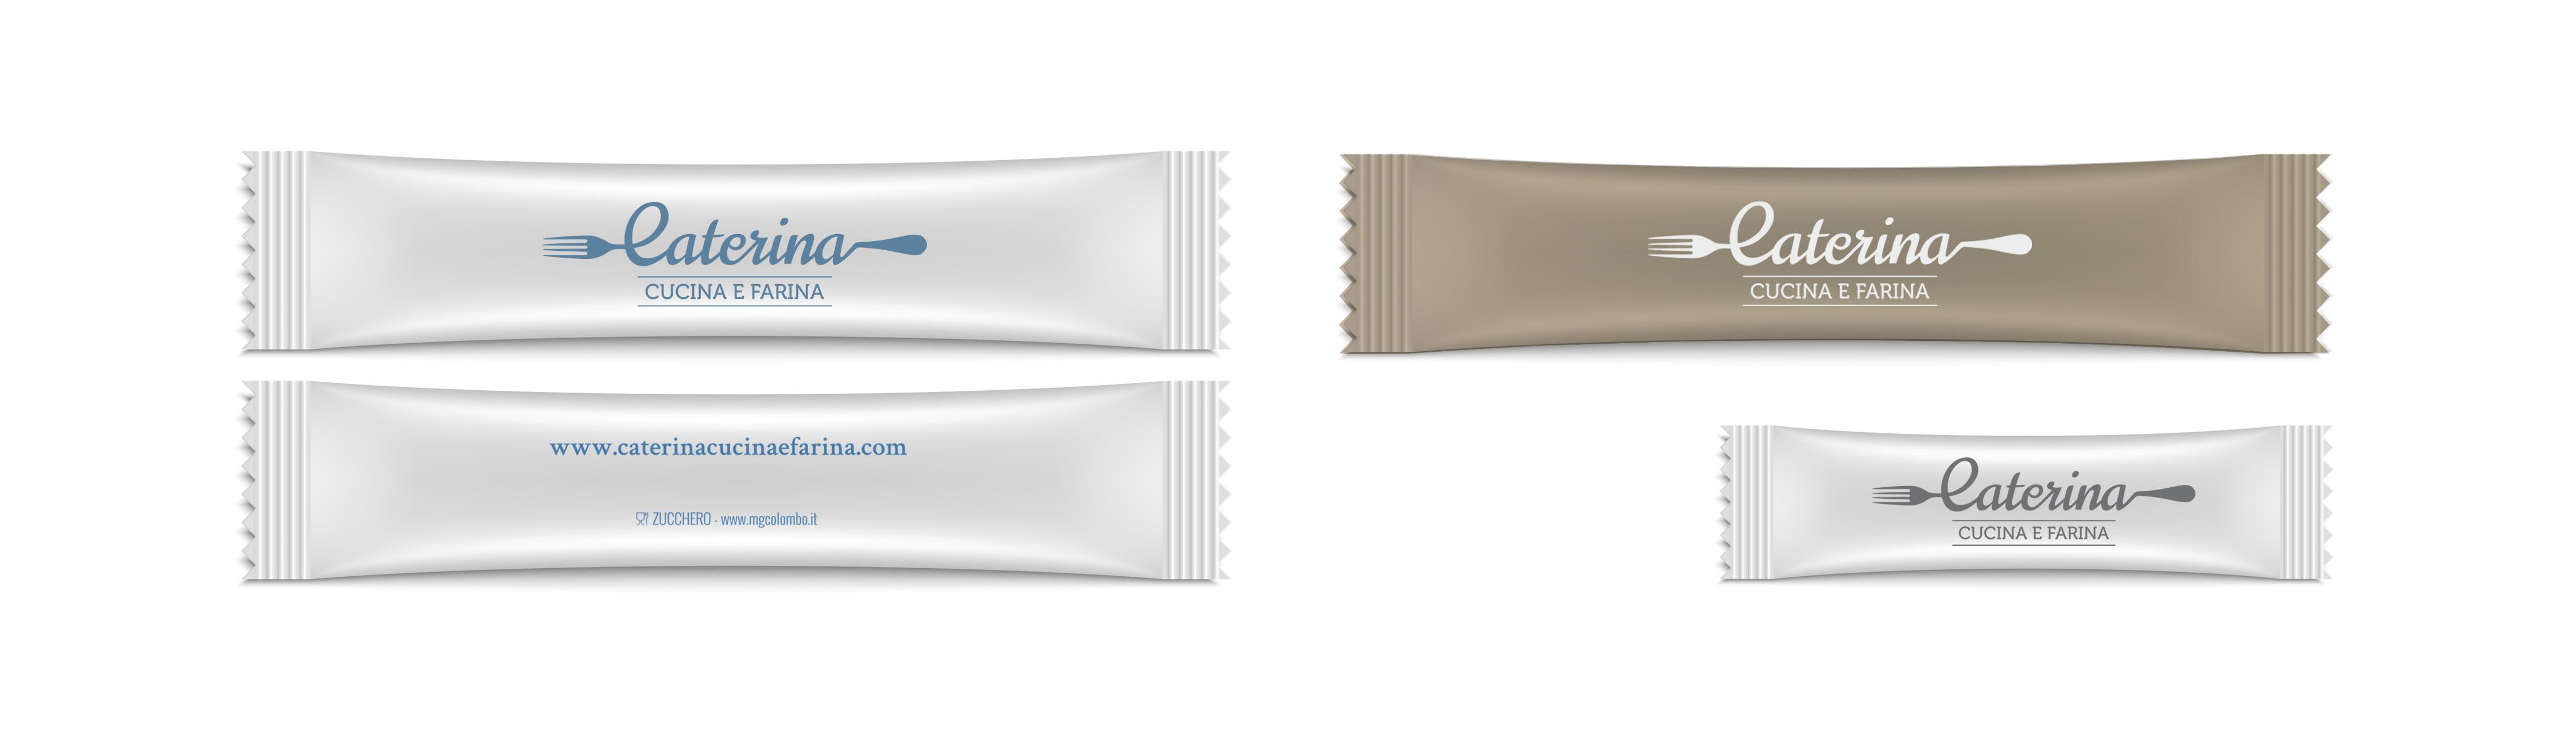 mintlab-brandidentity-caterina-Sugar-stick